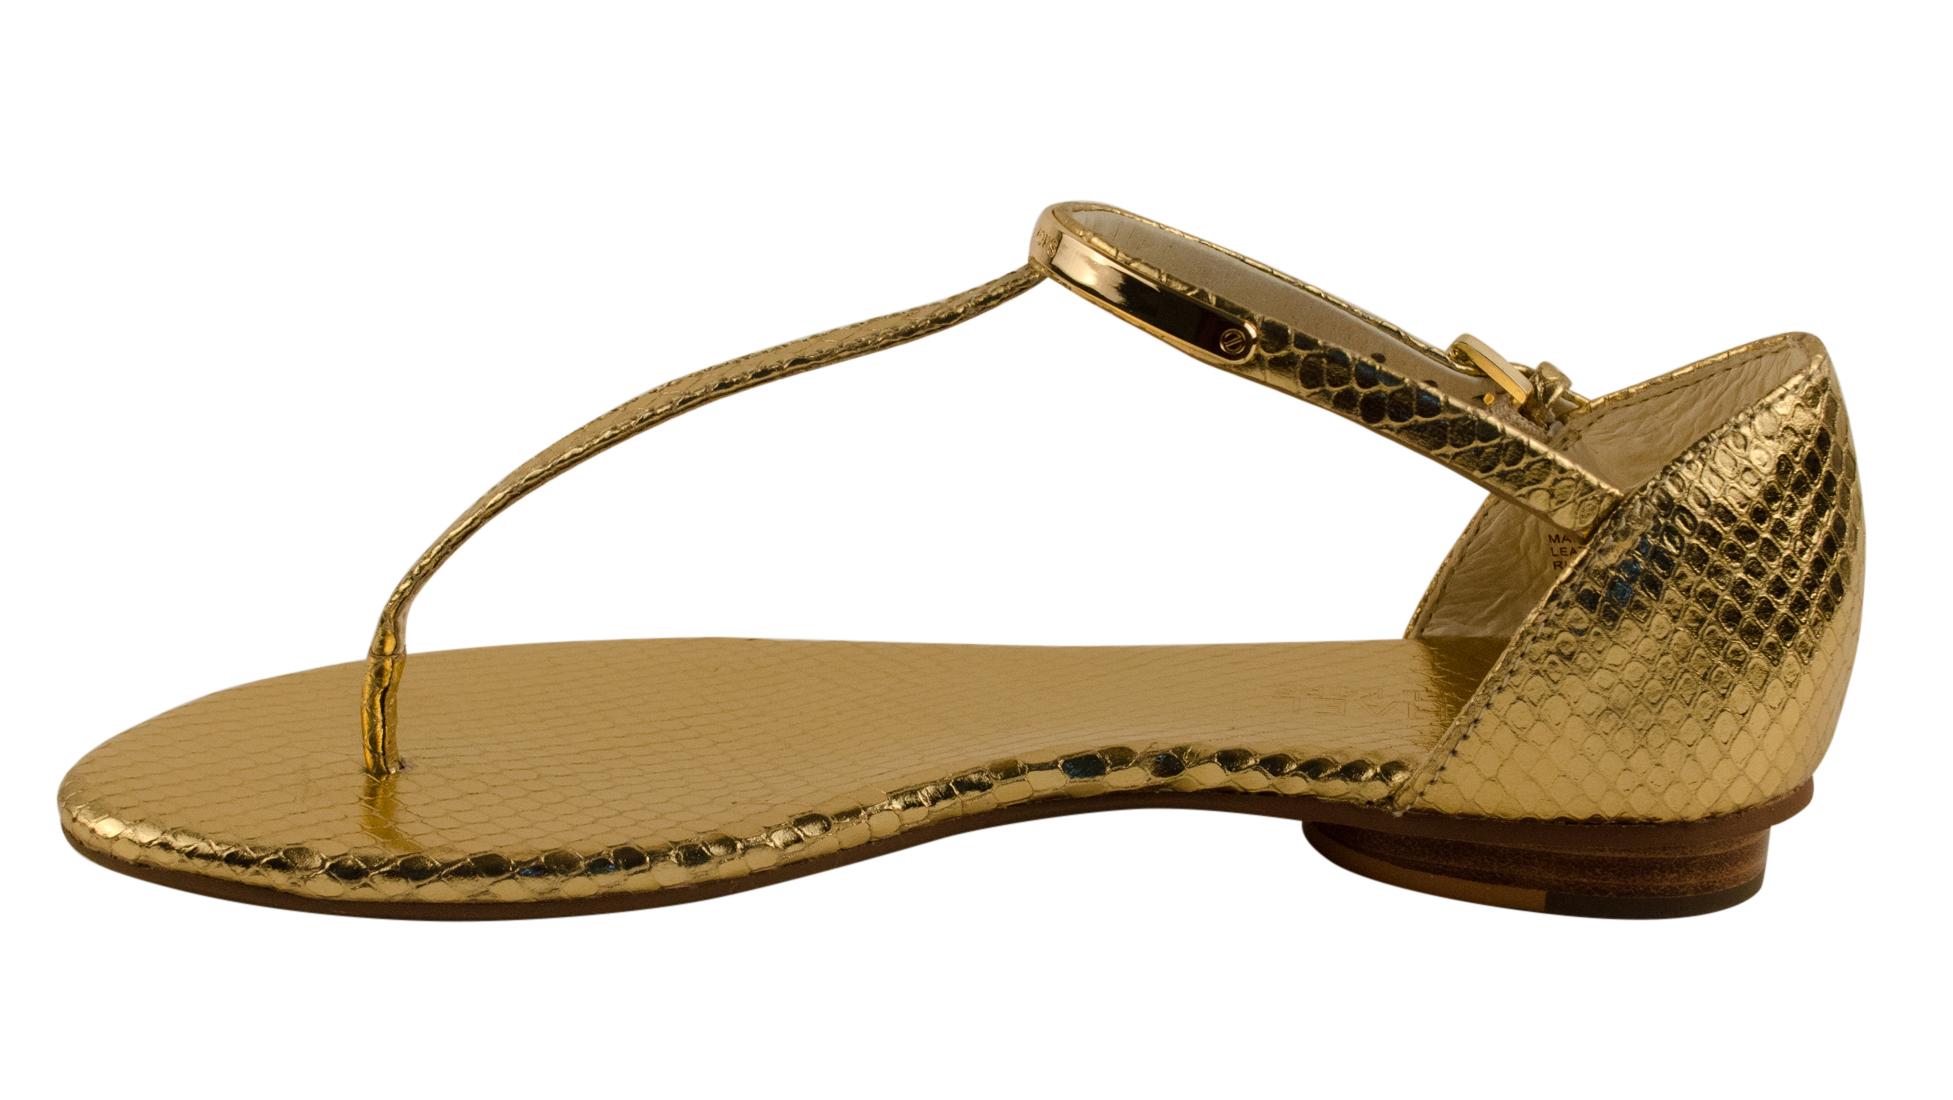 Lastest Clothing Shoes Amp Accessories Gt Women39s Shoes Gt Sandals Amp F